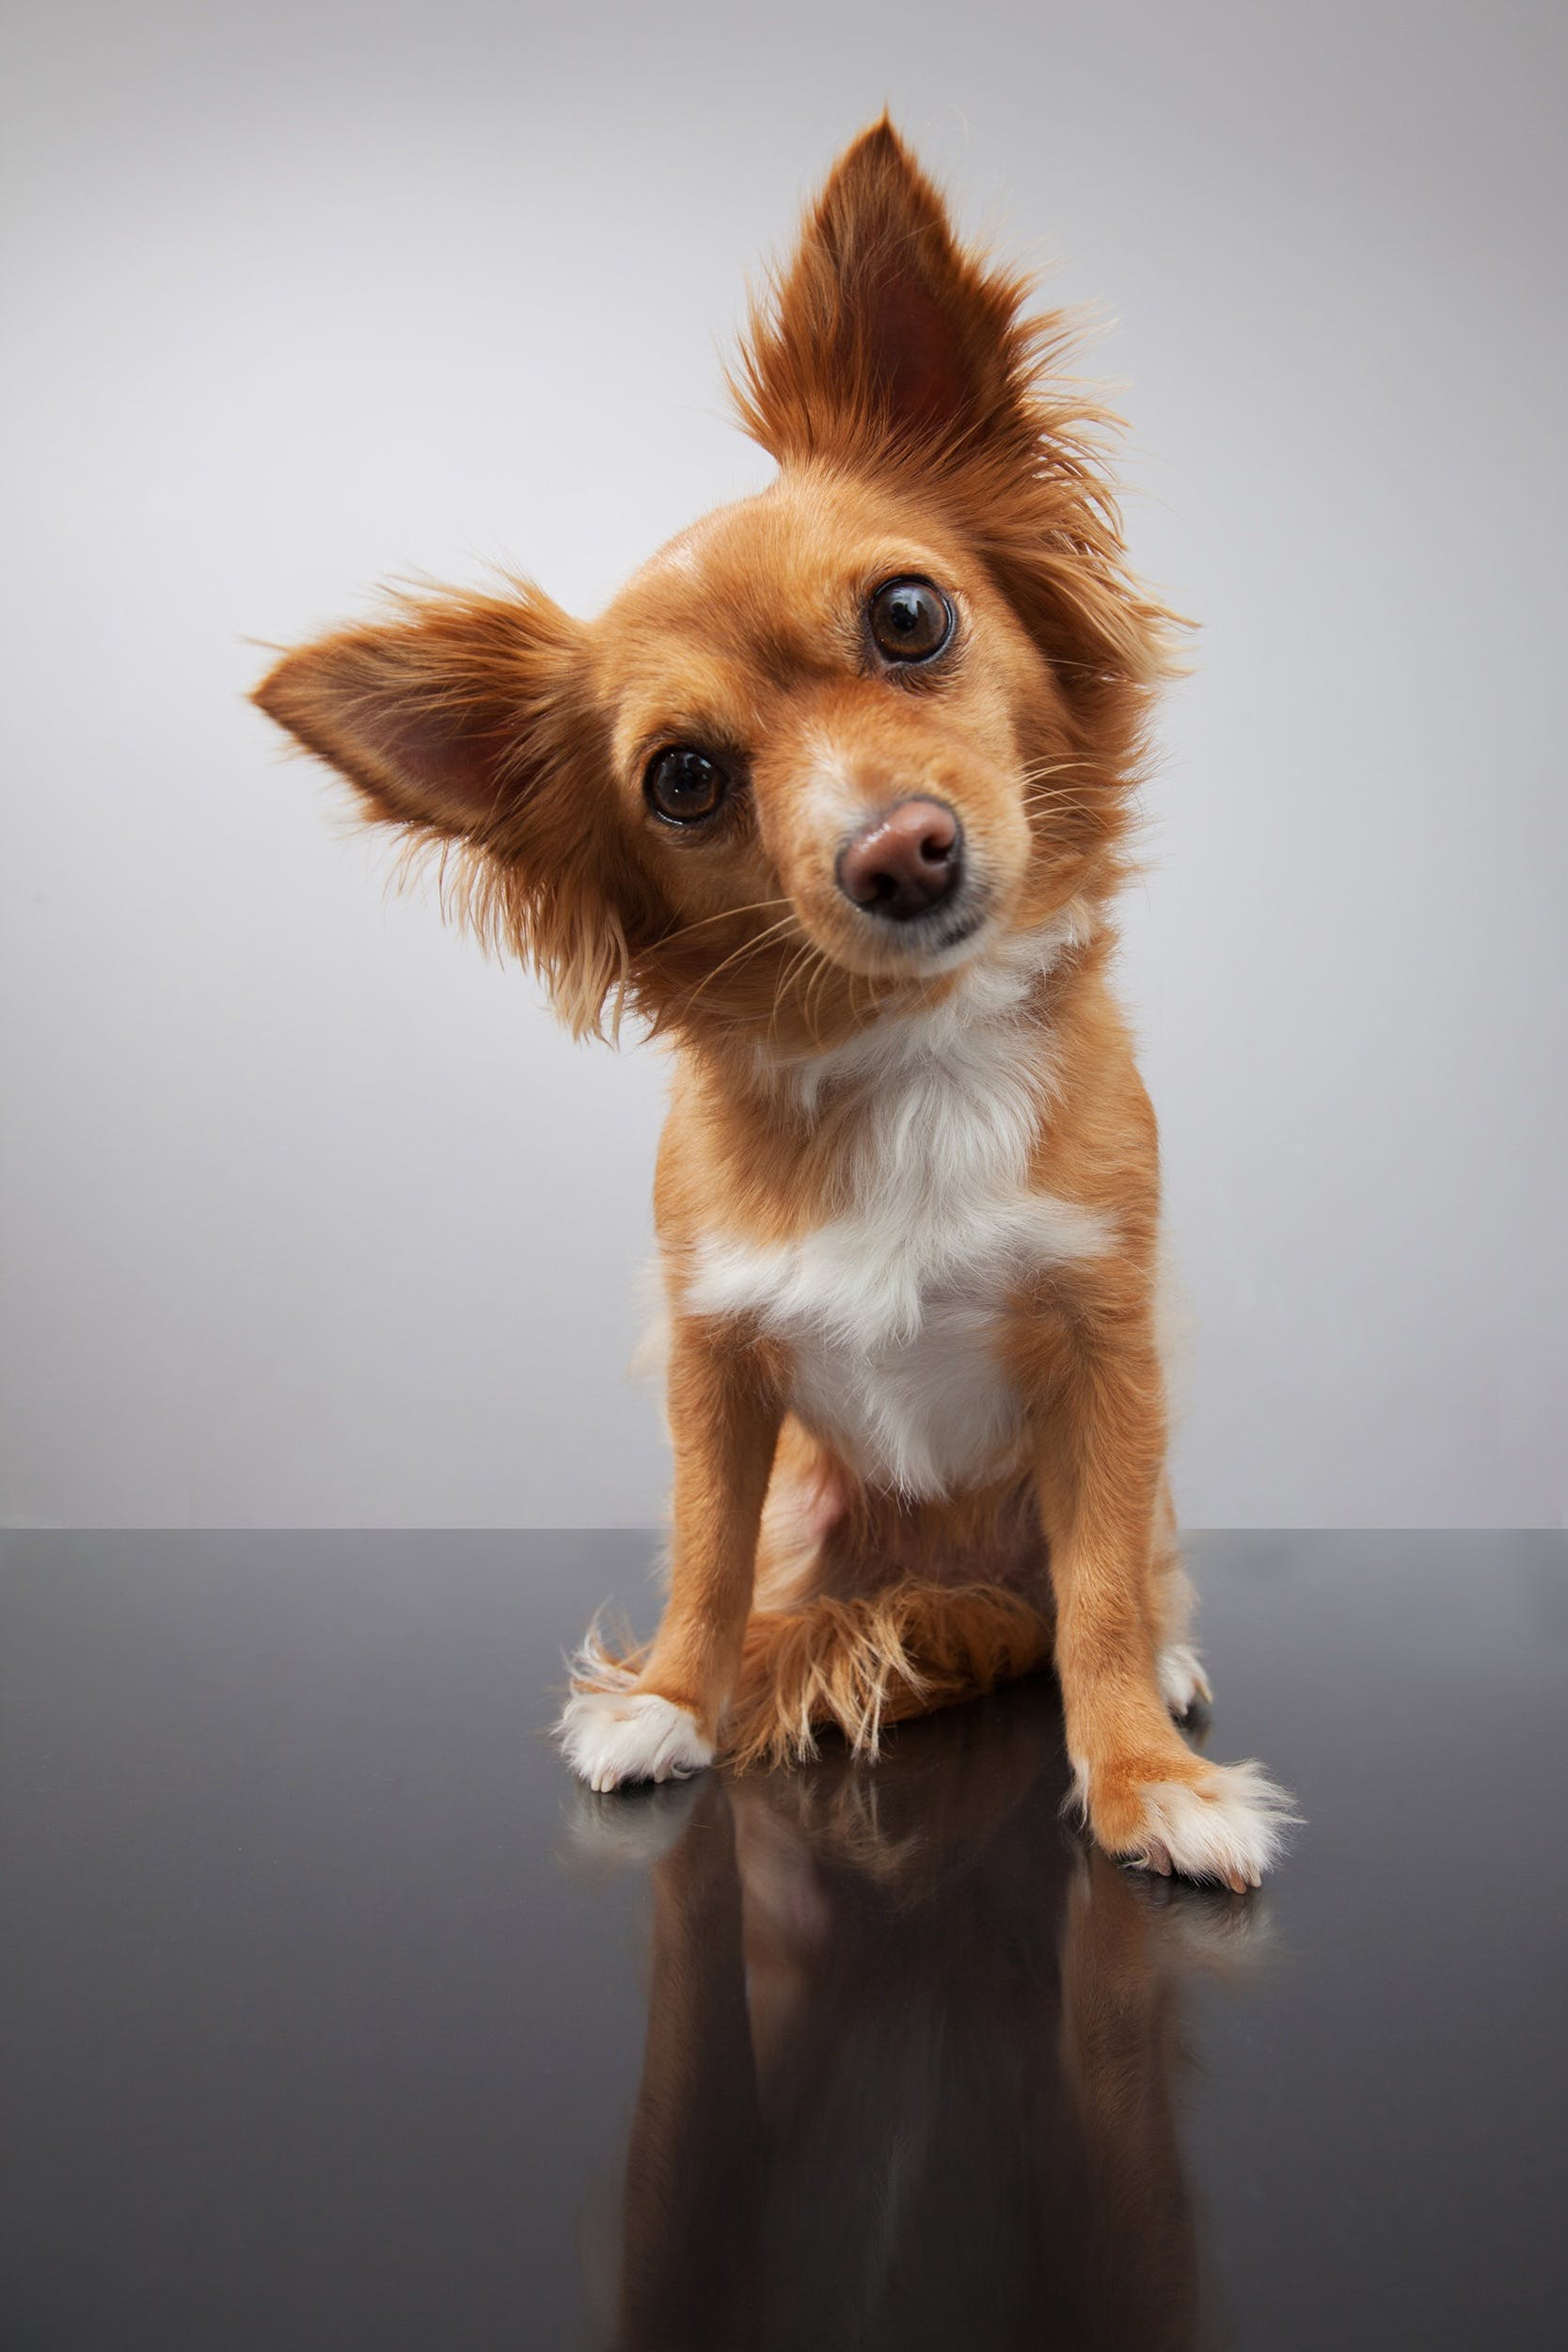 Free stock photo of animal, cute, dog, doggy